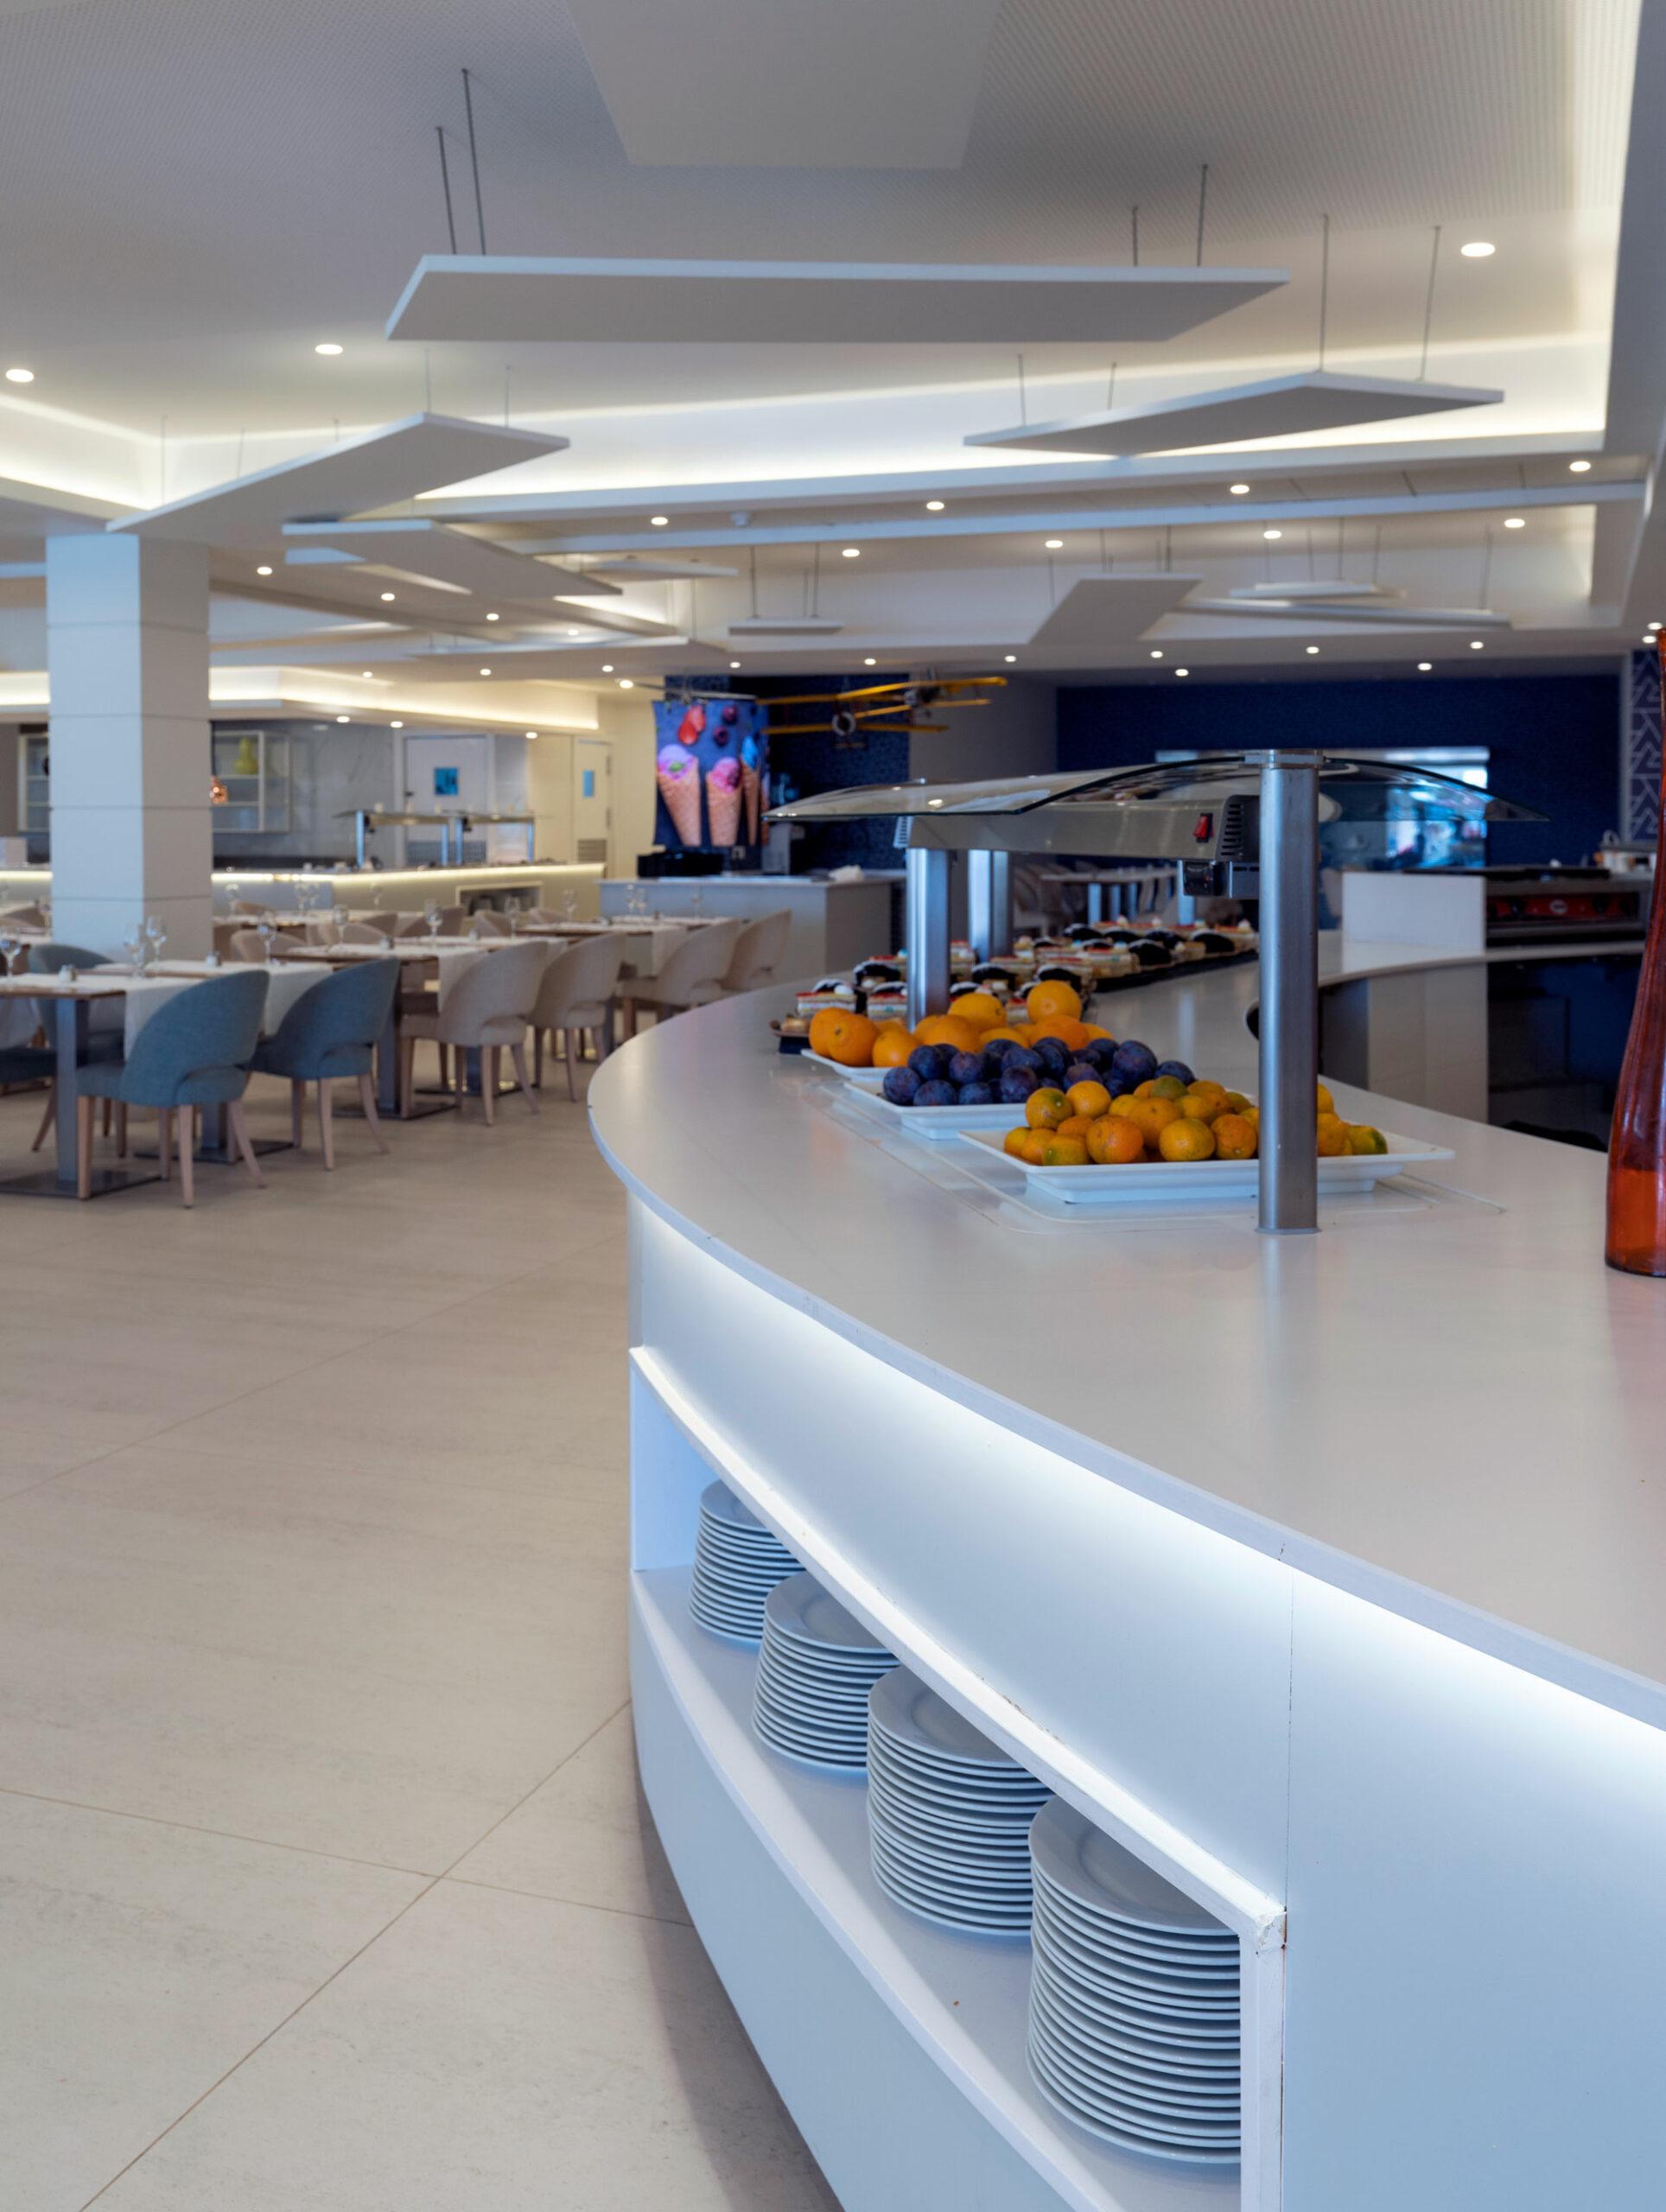 Hotel Mediterráneo  - Hotel Mediterraneo Park 9 Dekton Silestone Piedra Natural Cosentino scaled 63